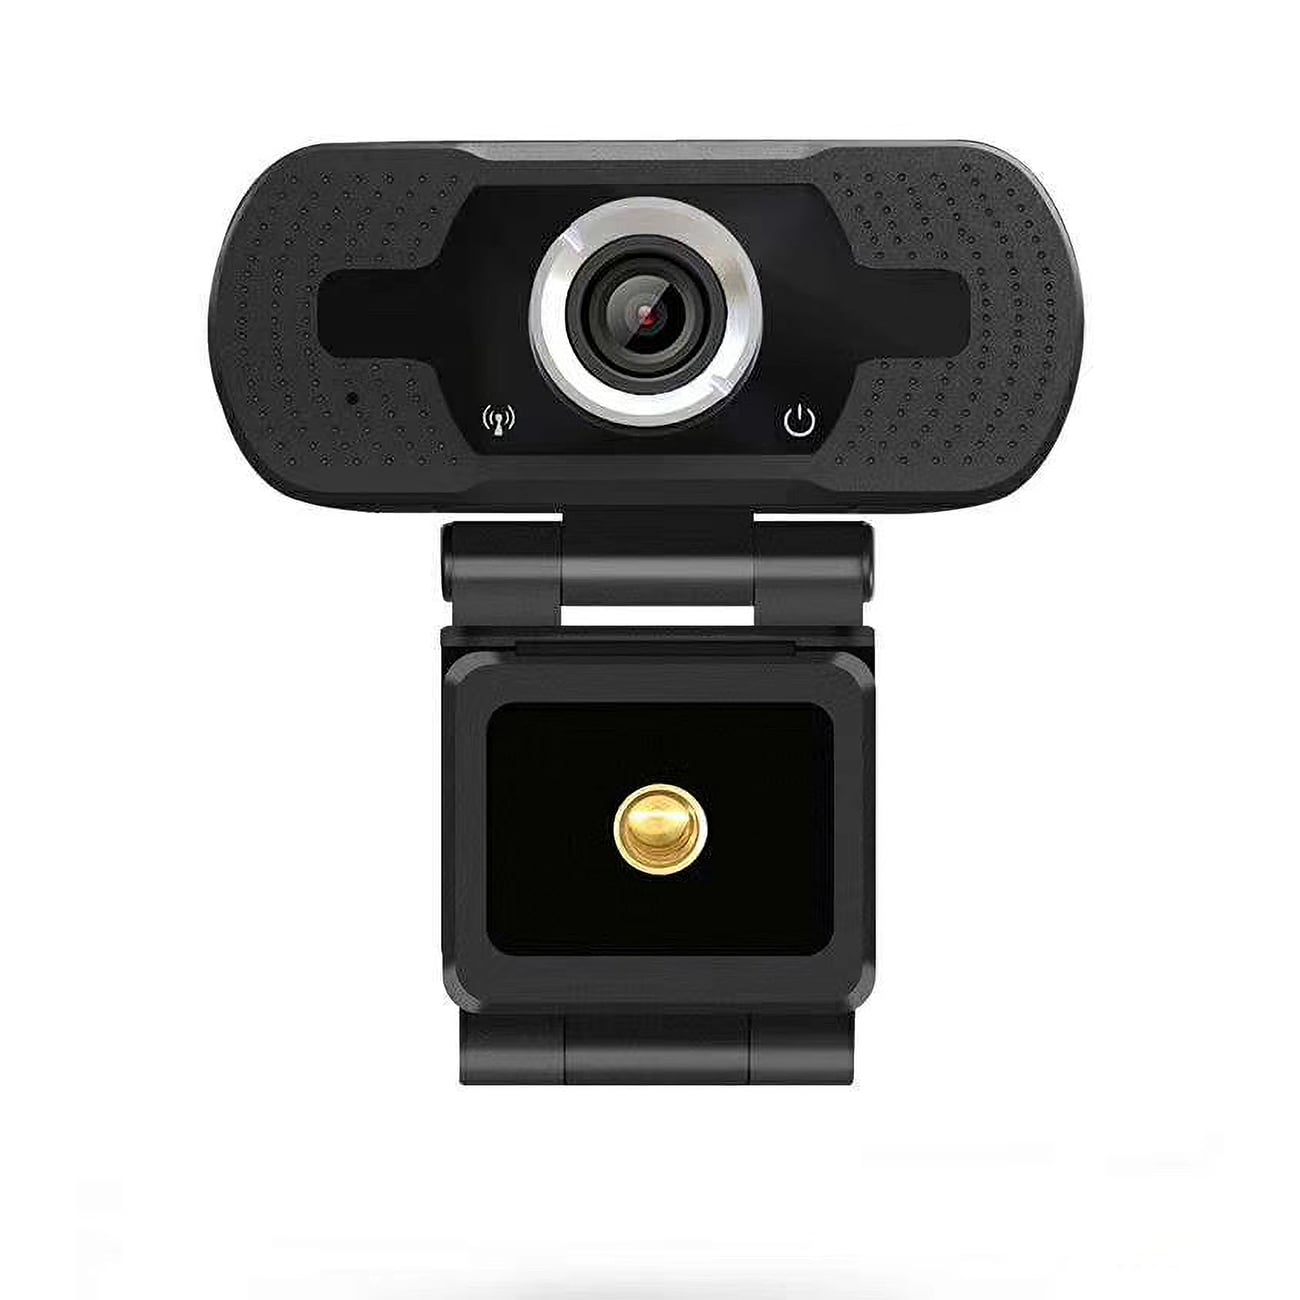 Webcam for Streaming Microphone Camera USB FHD SP-WCAM01 - 8